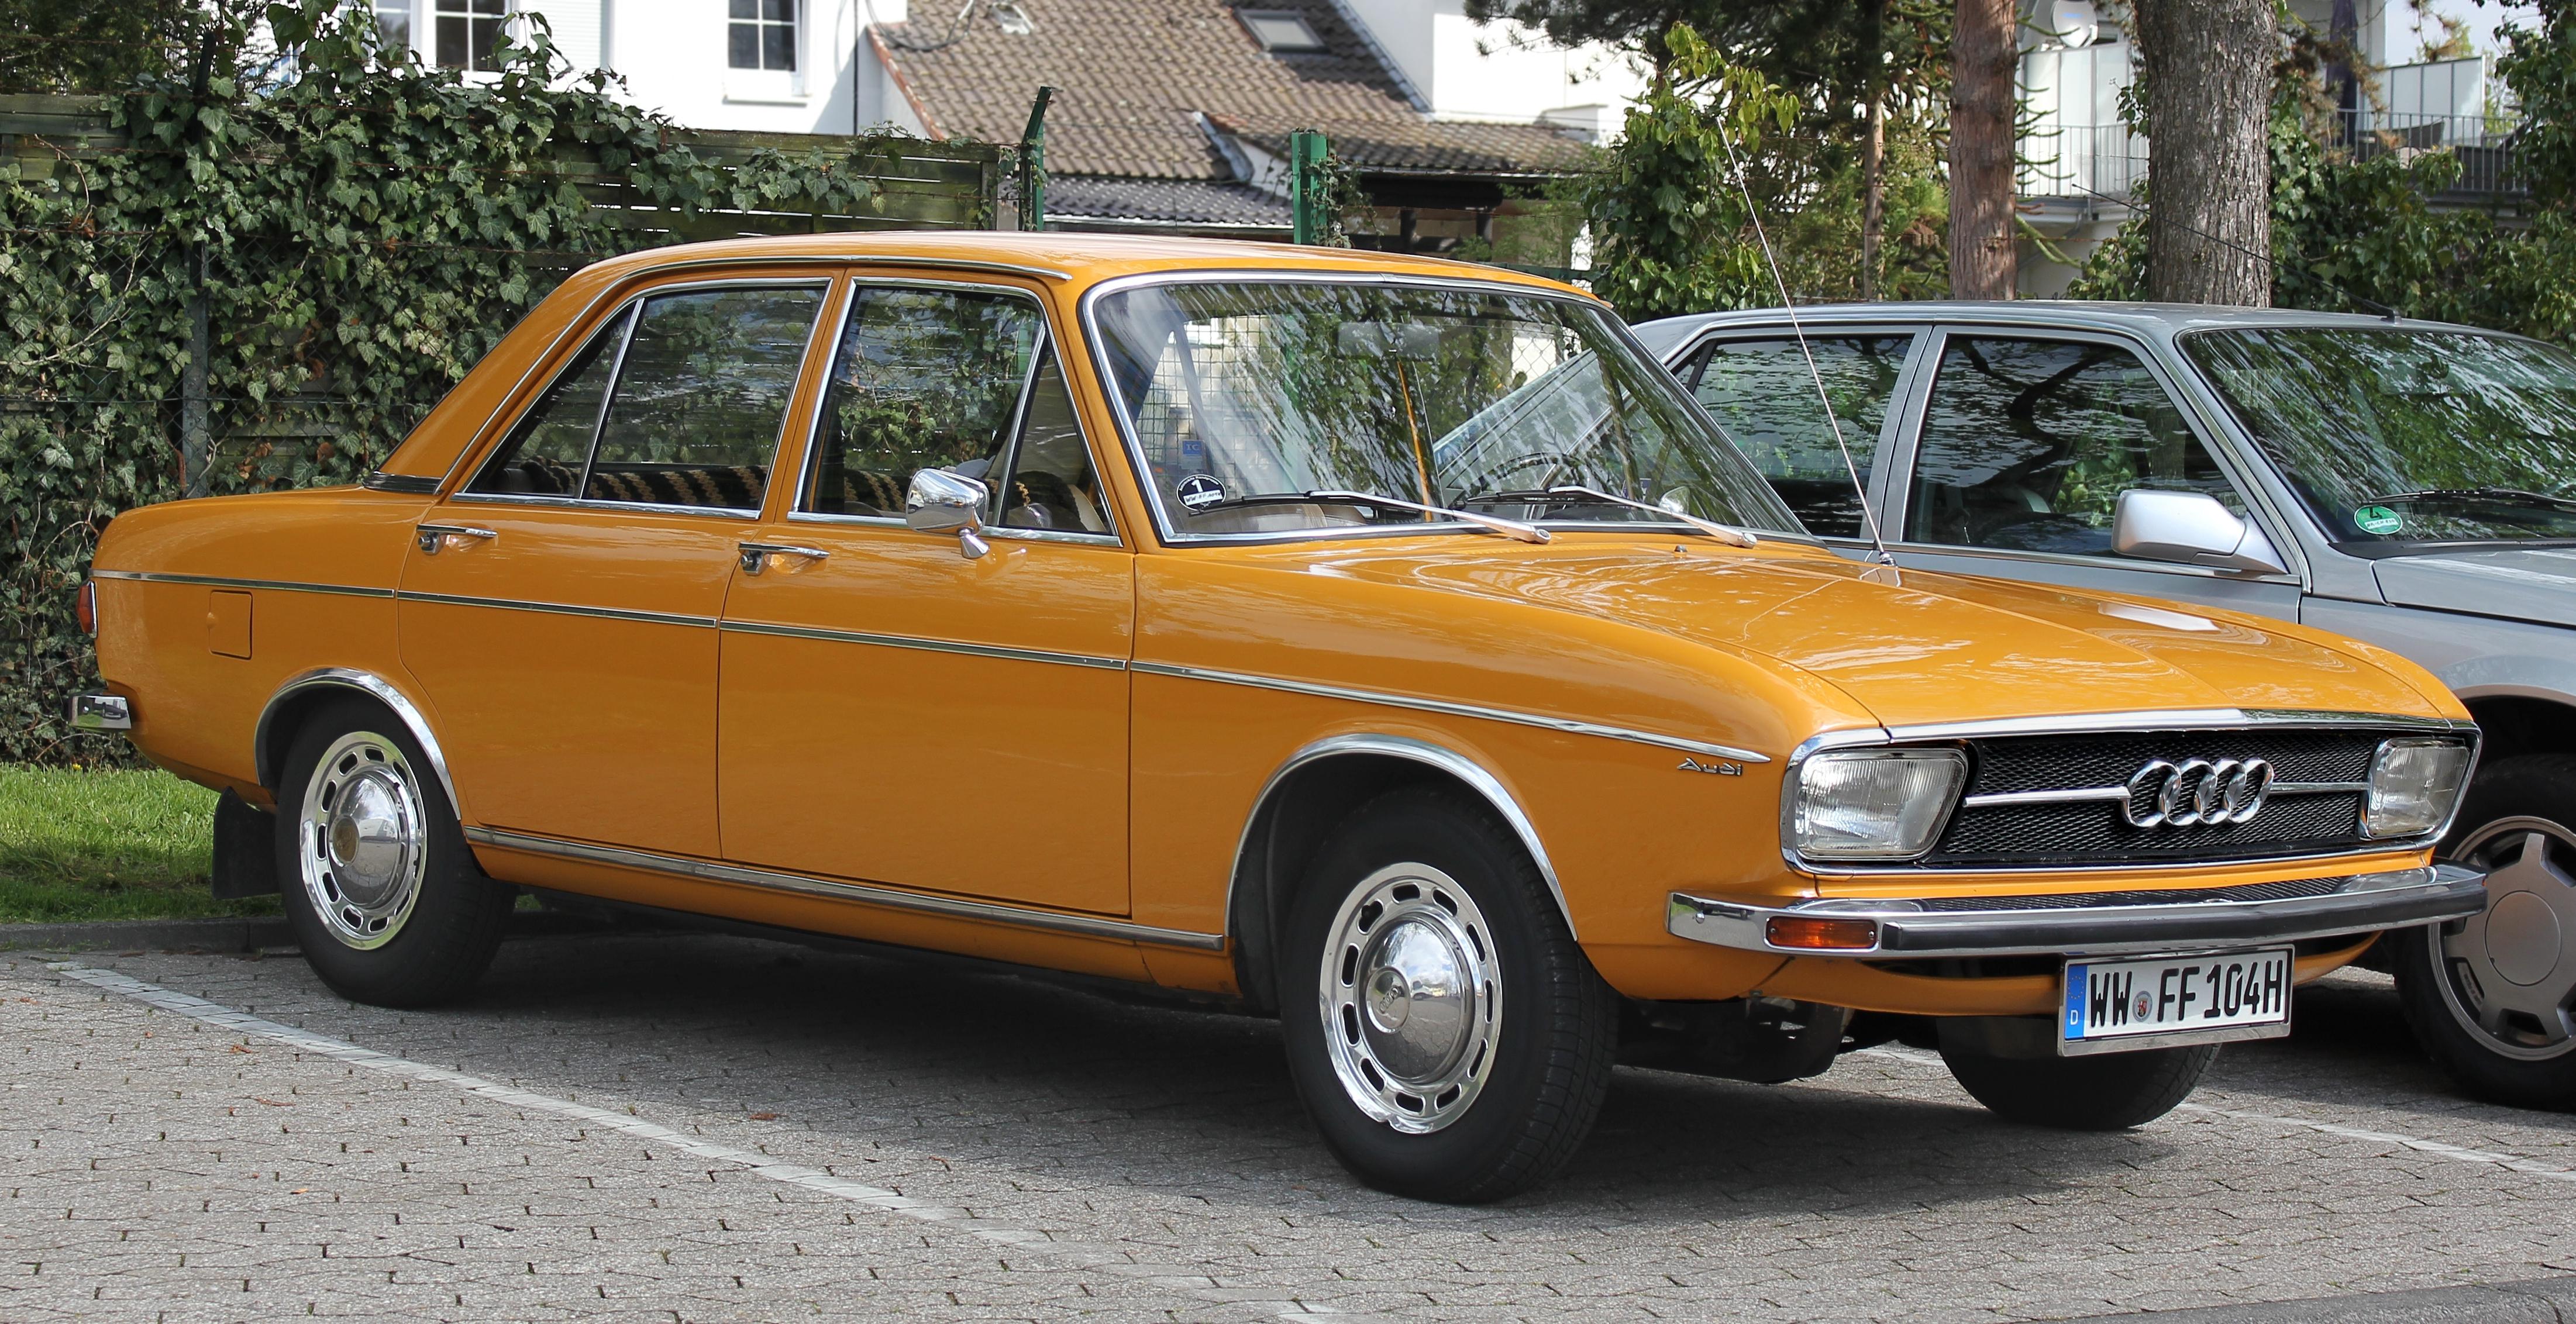 File Audi 100 C 1 Bj 1972 6703 R Schmal Jpg